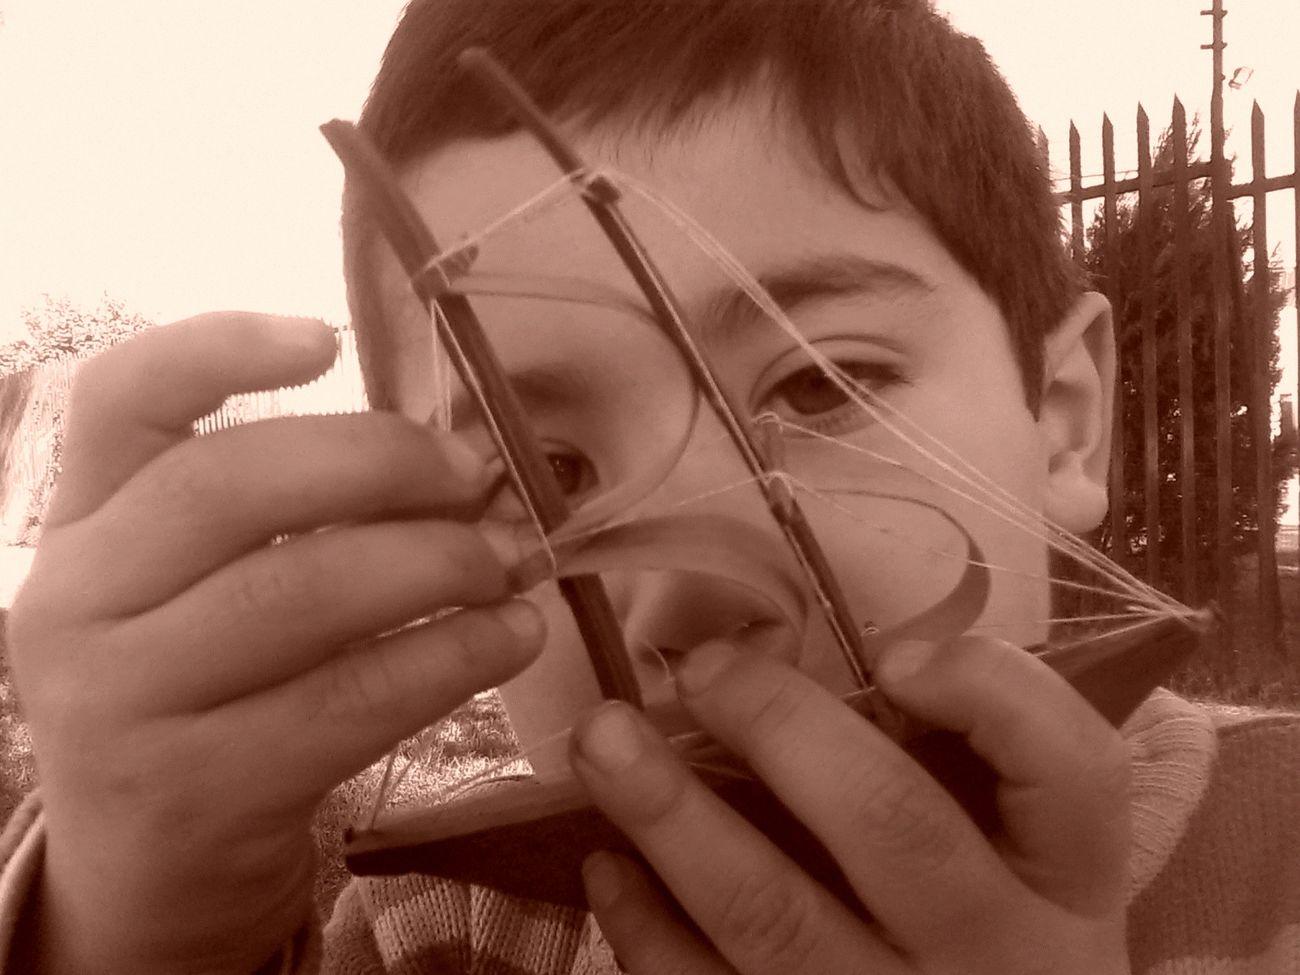 Inocencia oculta, mi hermoso hijo